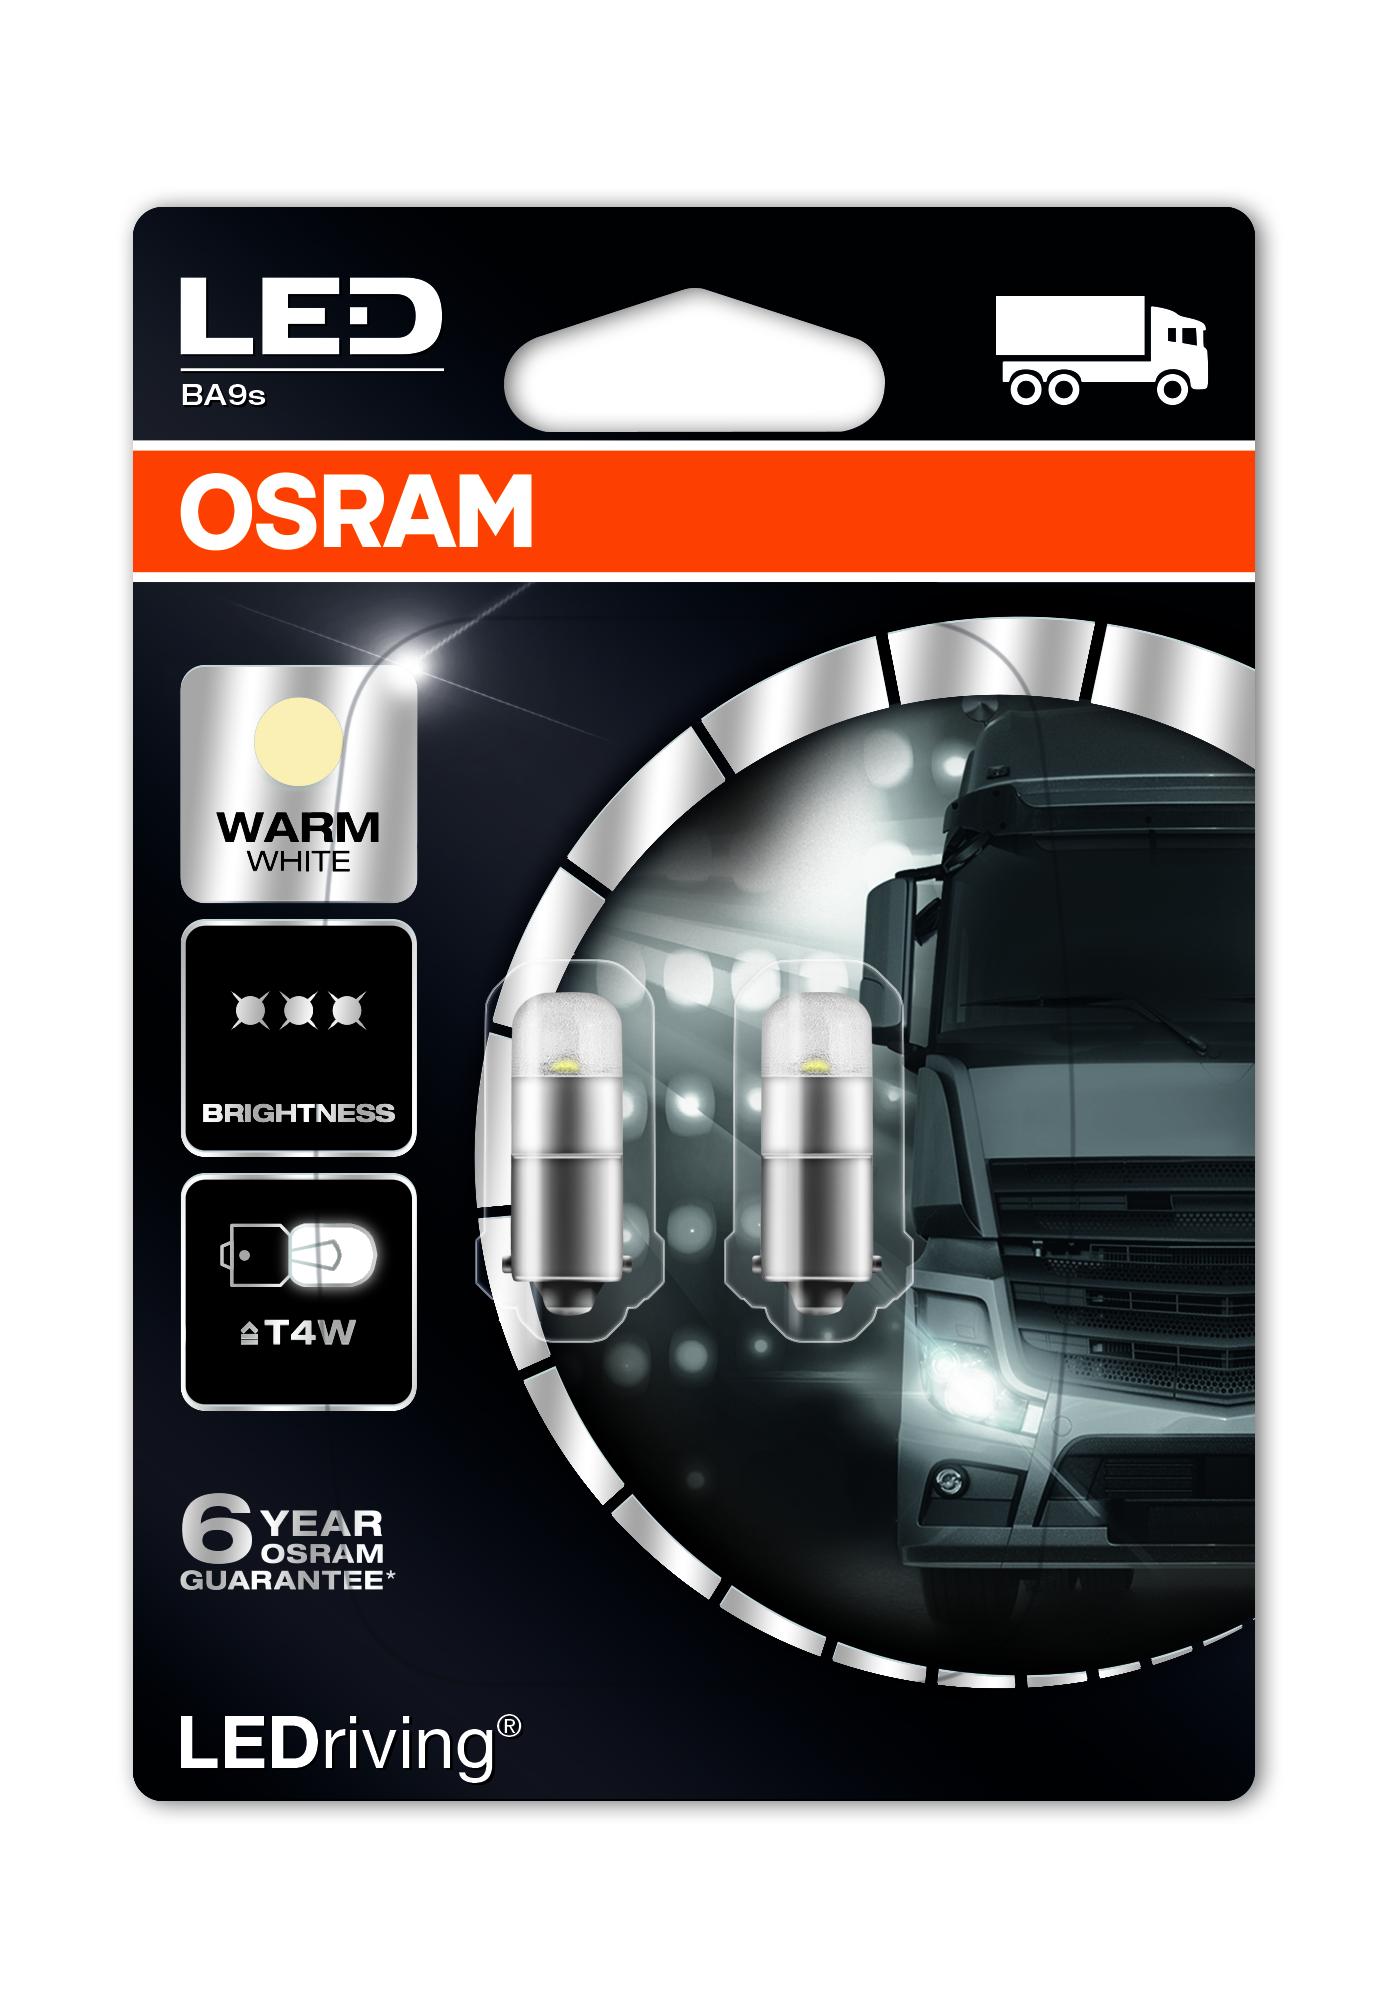 Osram LED, LEDriving Premium, T4W, BA9s, 24V, 0,8W, 3924WW 4000K